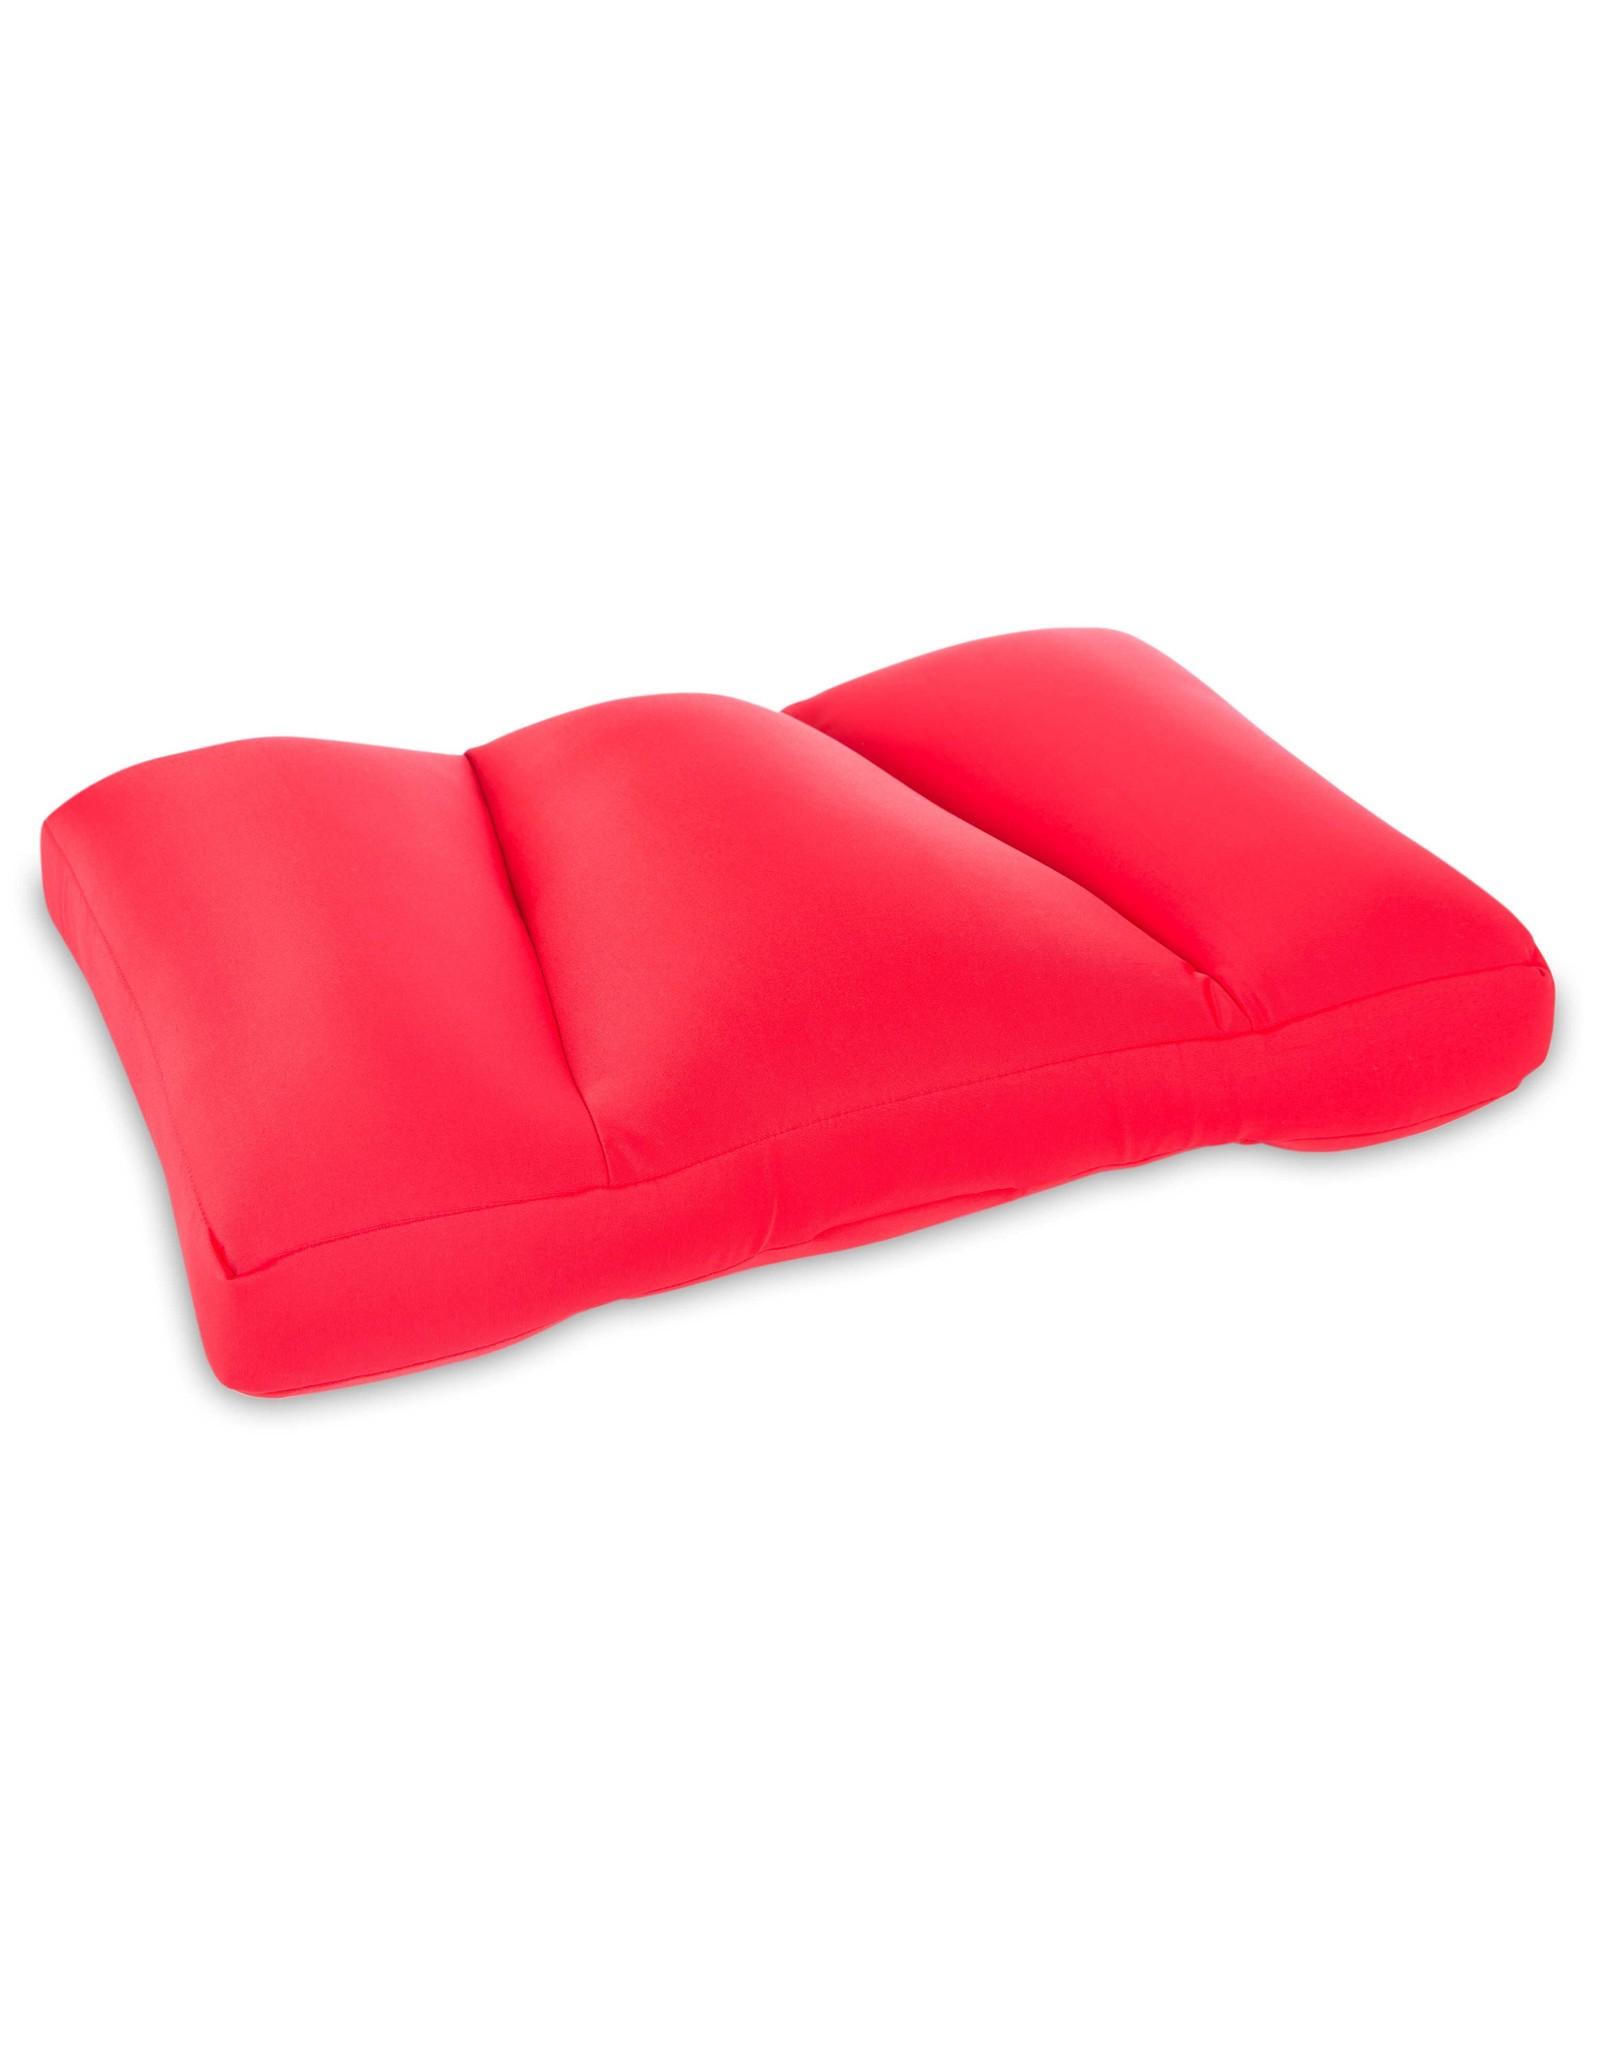 Kuschel-Maxx Kuschel Maxx -  Cuscino Ortopedico Rot